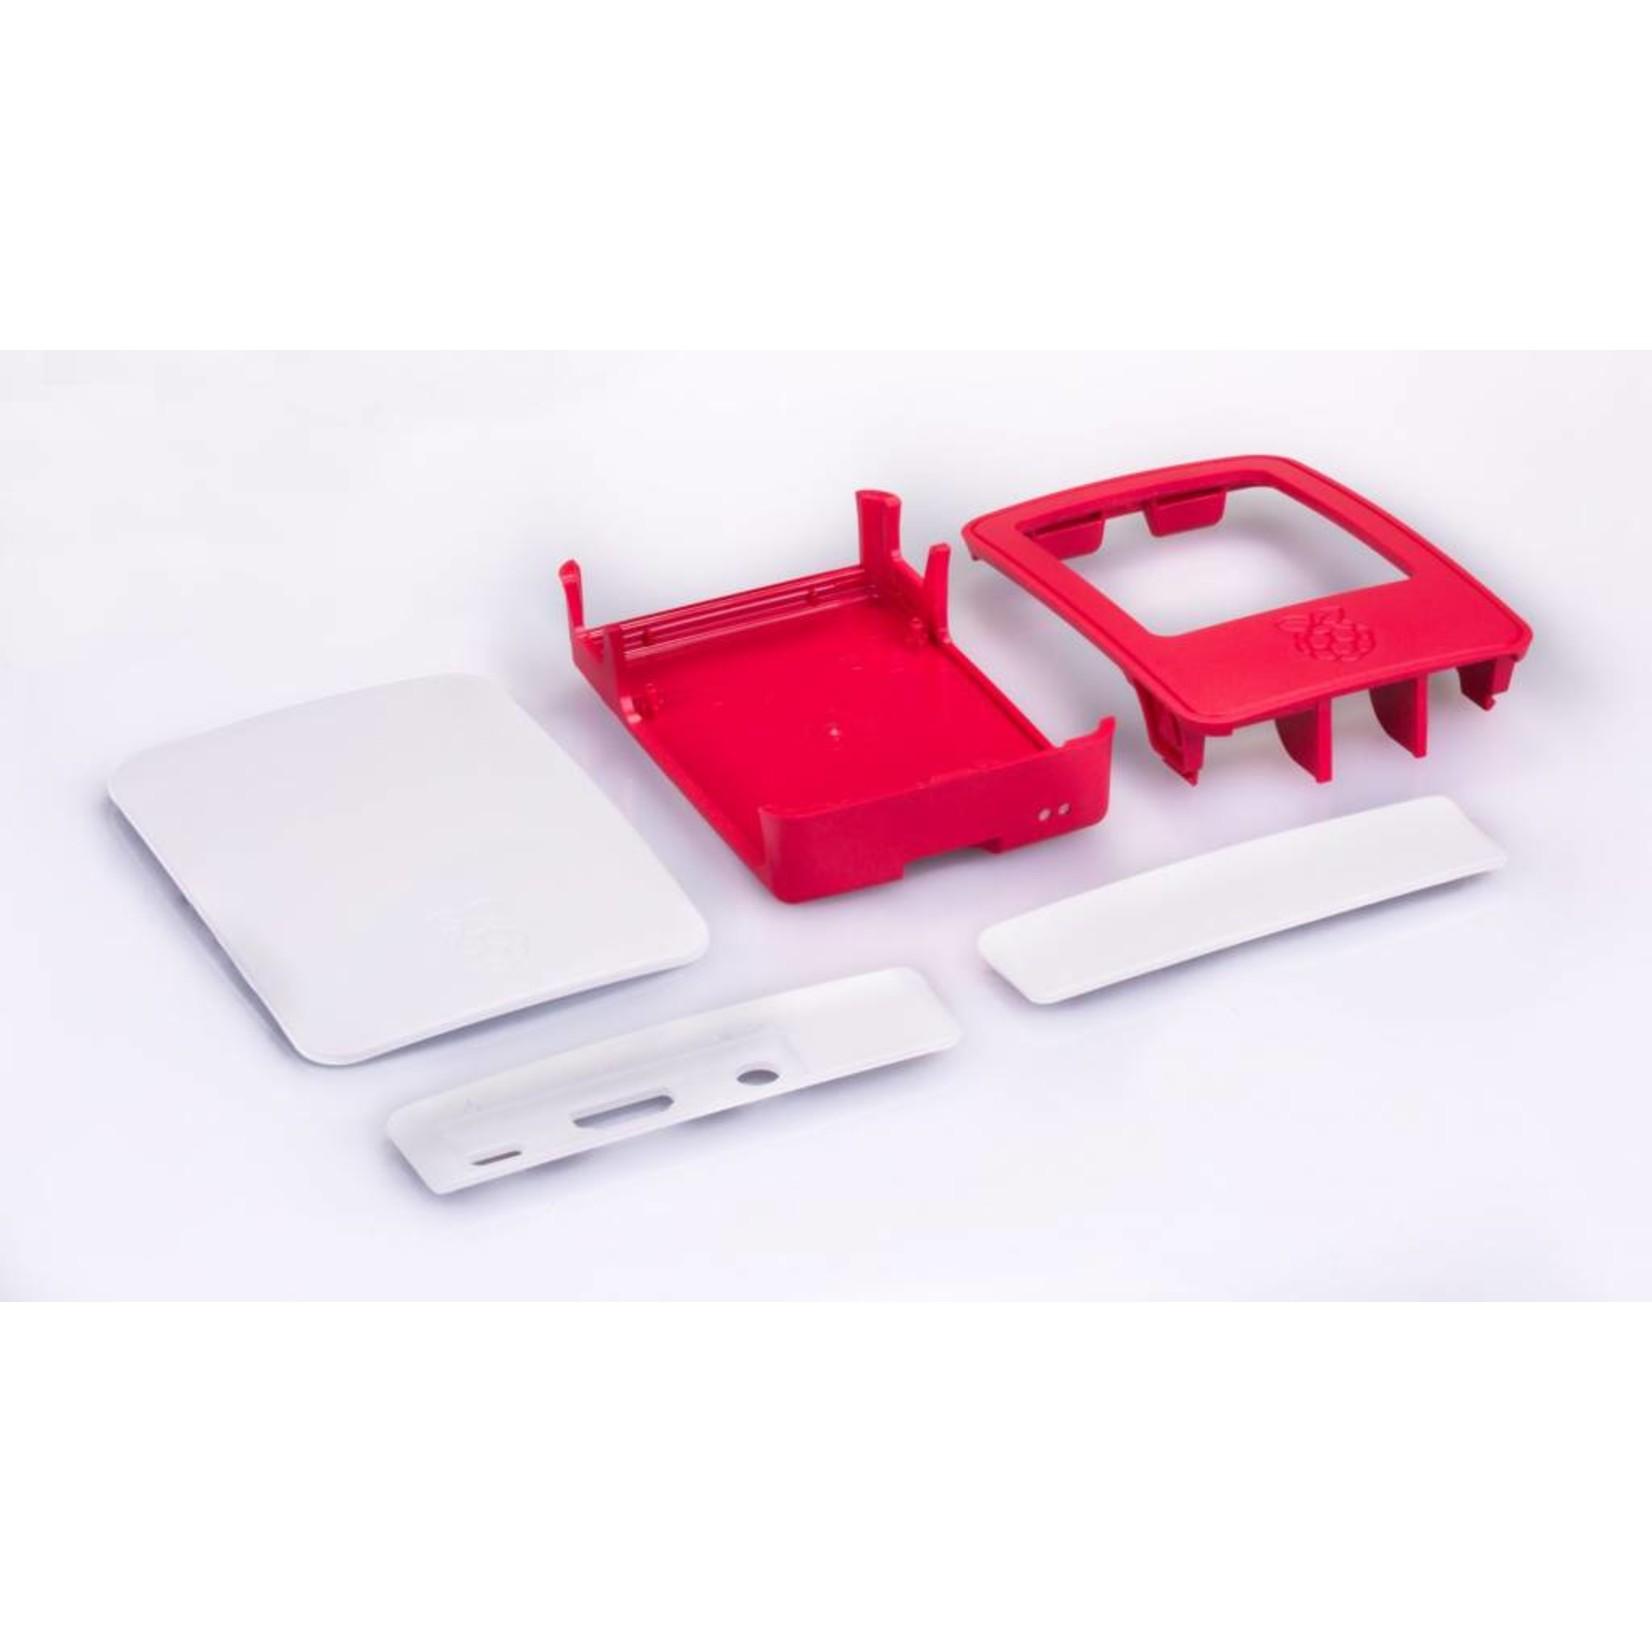 Raspberry Pi Boîtier pour Raspberry Pi 3B (+) - Rouge / Blanc